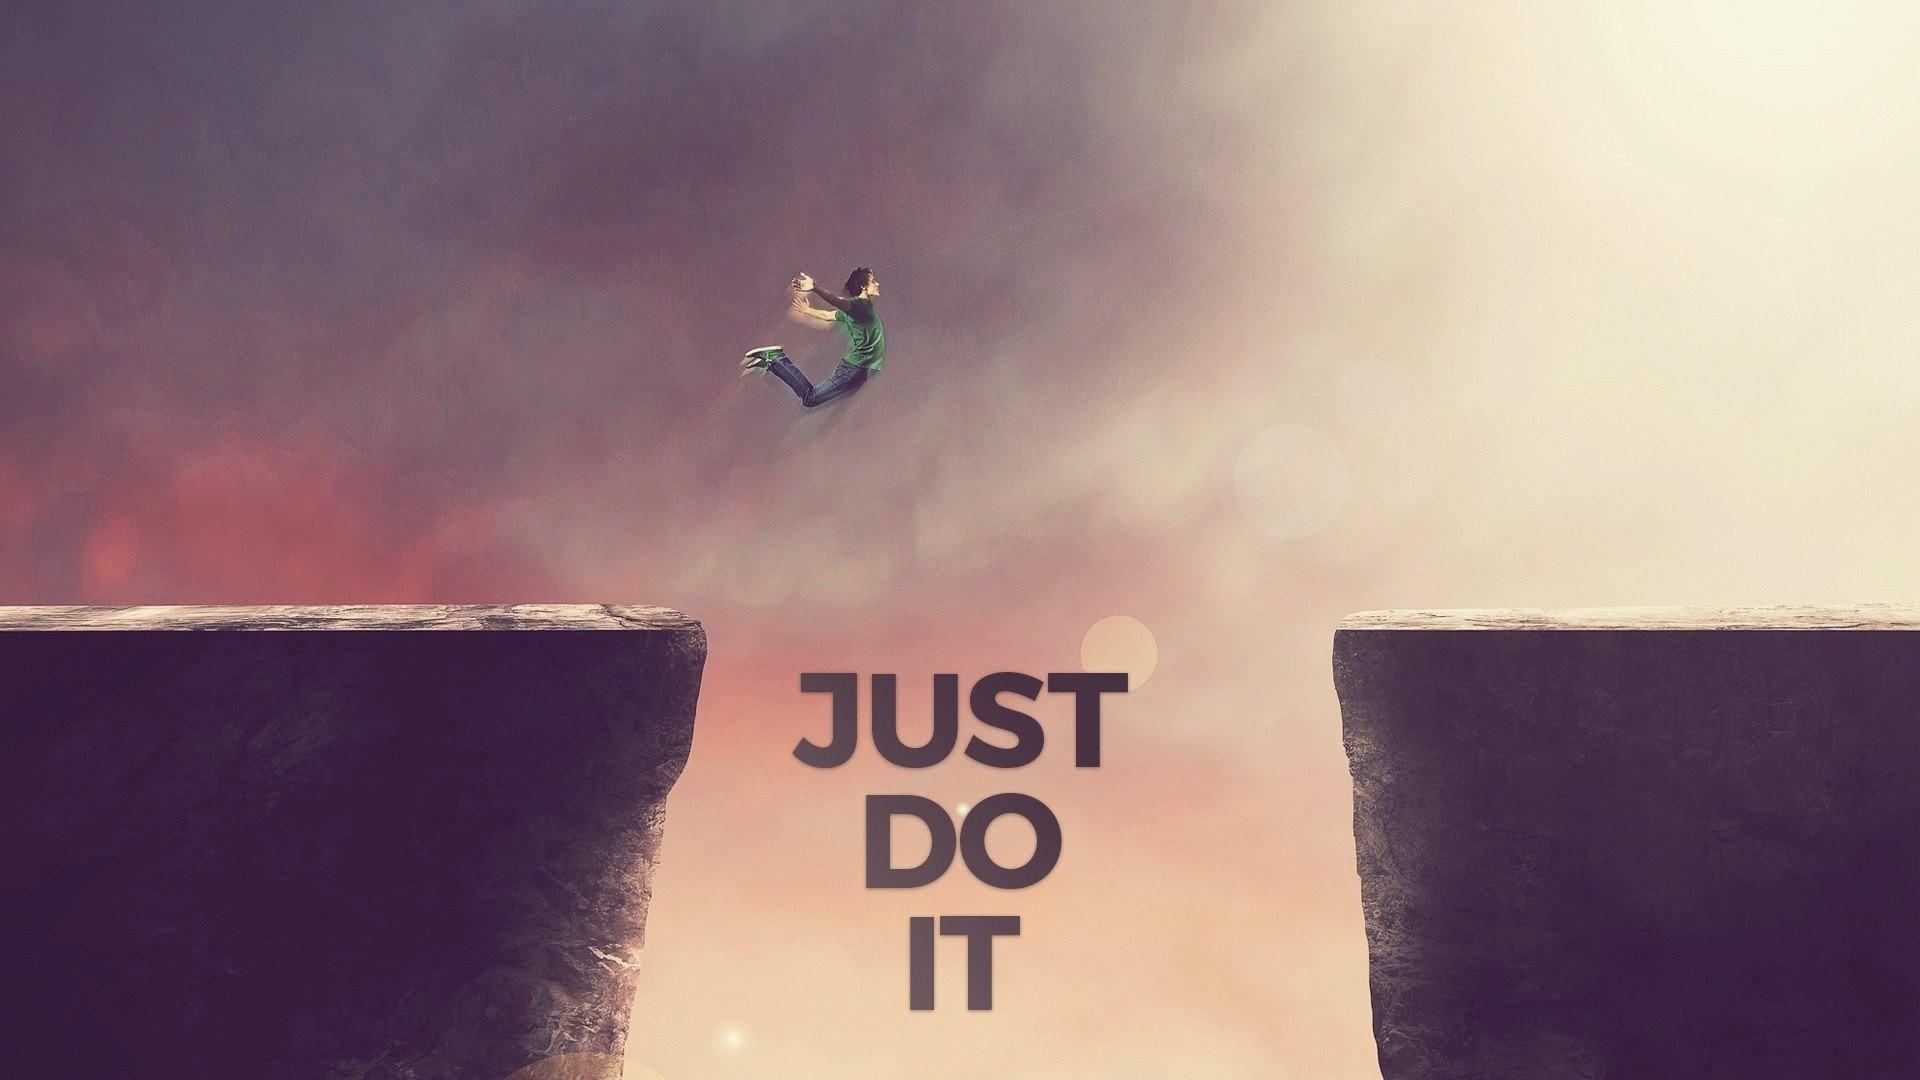 Motivational pics